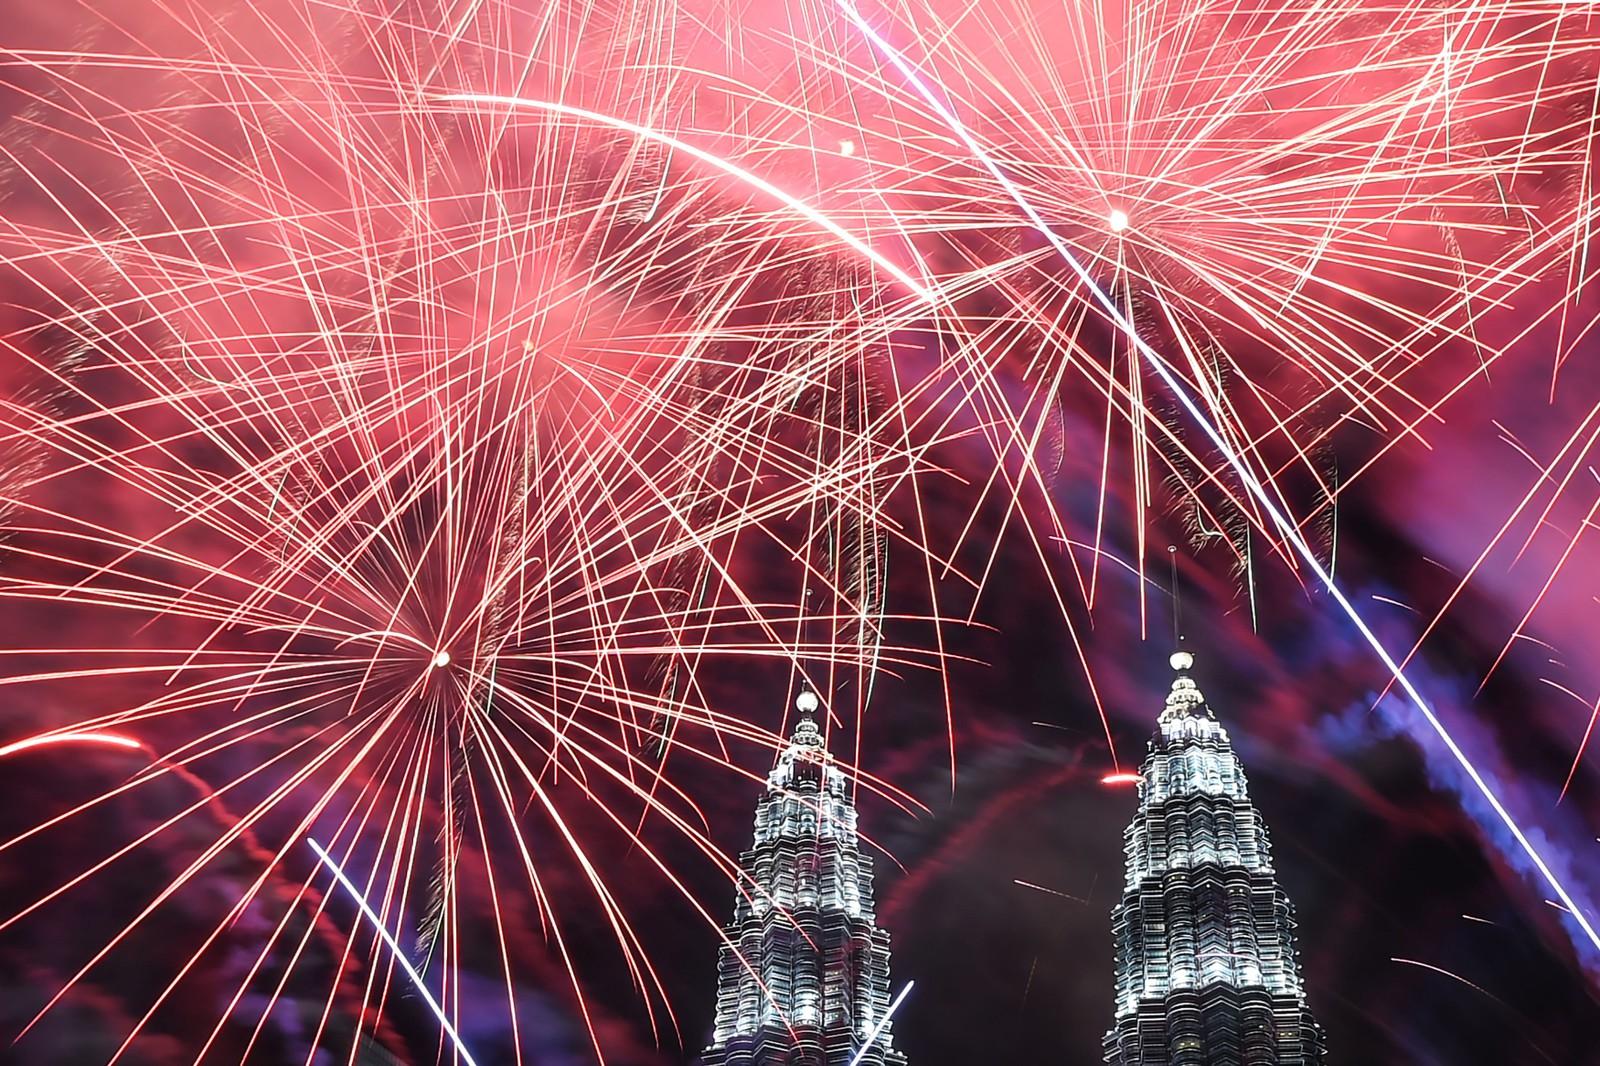 KUALA LUMPUR: Fyrverkeri over Petronas-bygningen med tvillingtårnene i Kuala Lumpur i Malaysia.